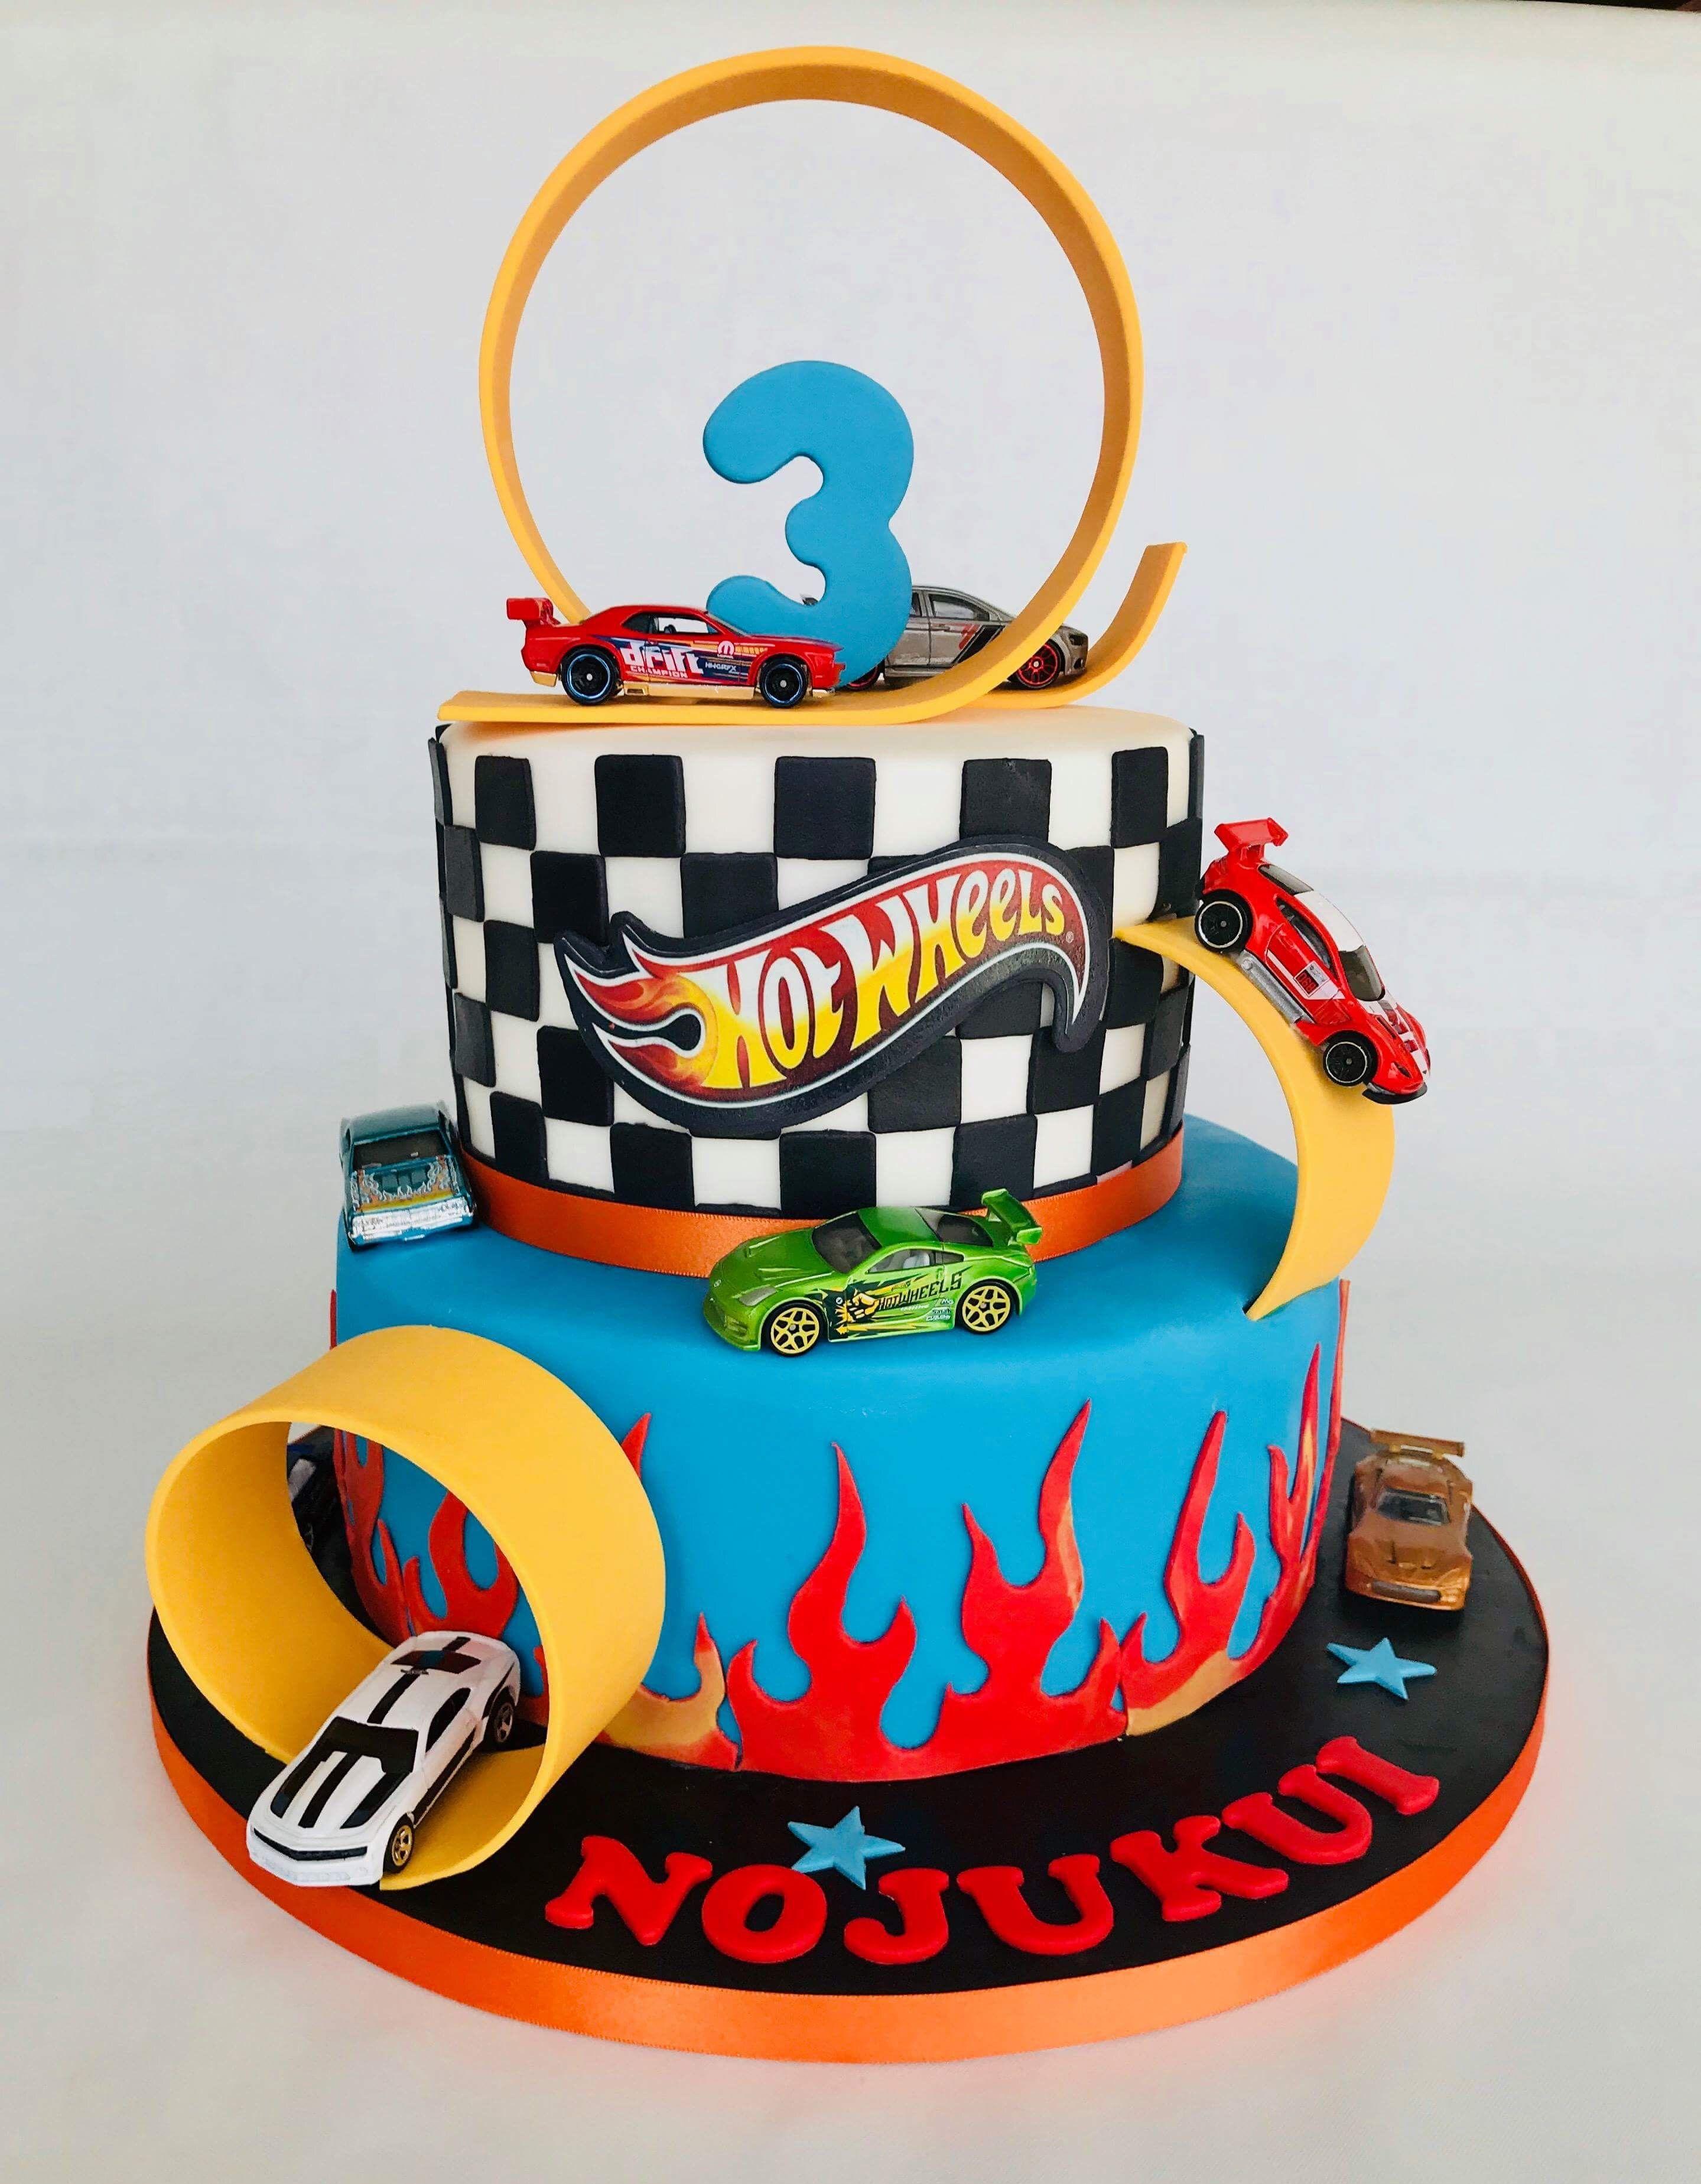 Hot Wheels Car Cake Hot Wheels Birthday Cake Hot Wheels Birthday Hot Wheels Cake